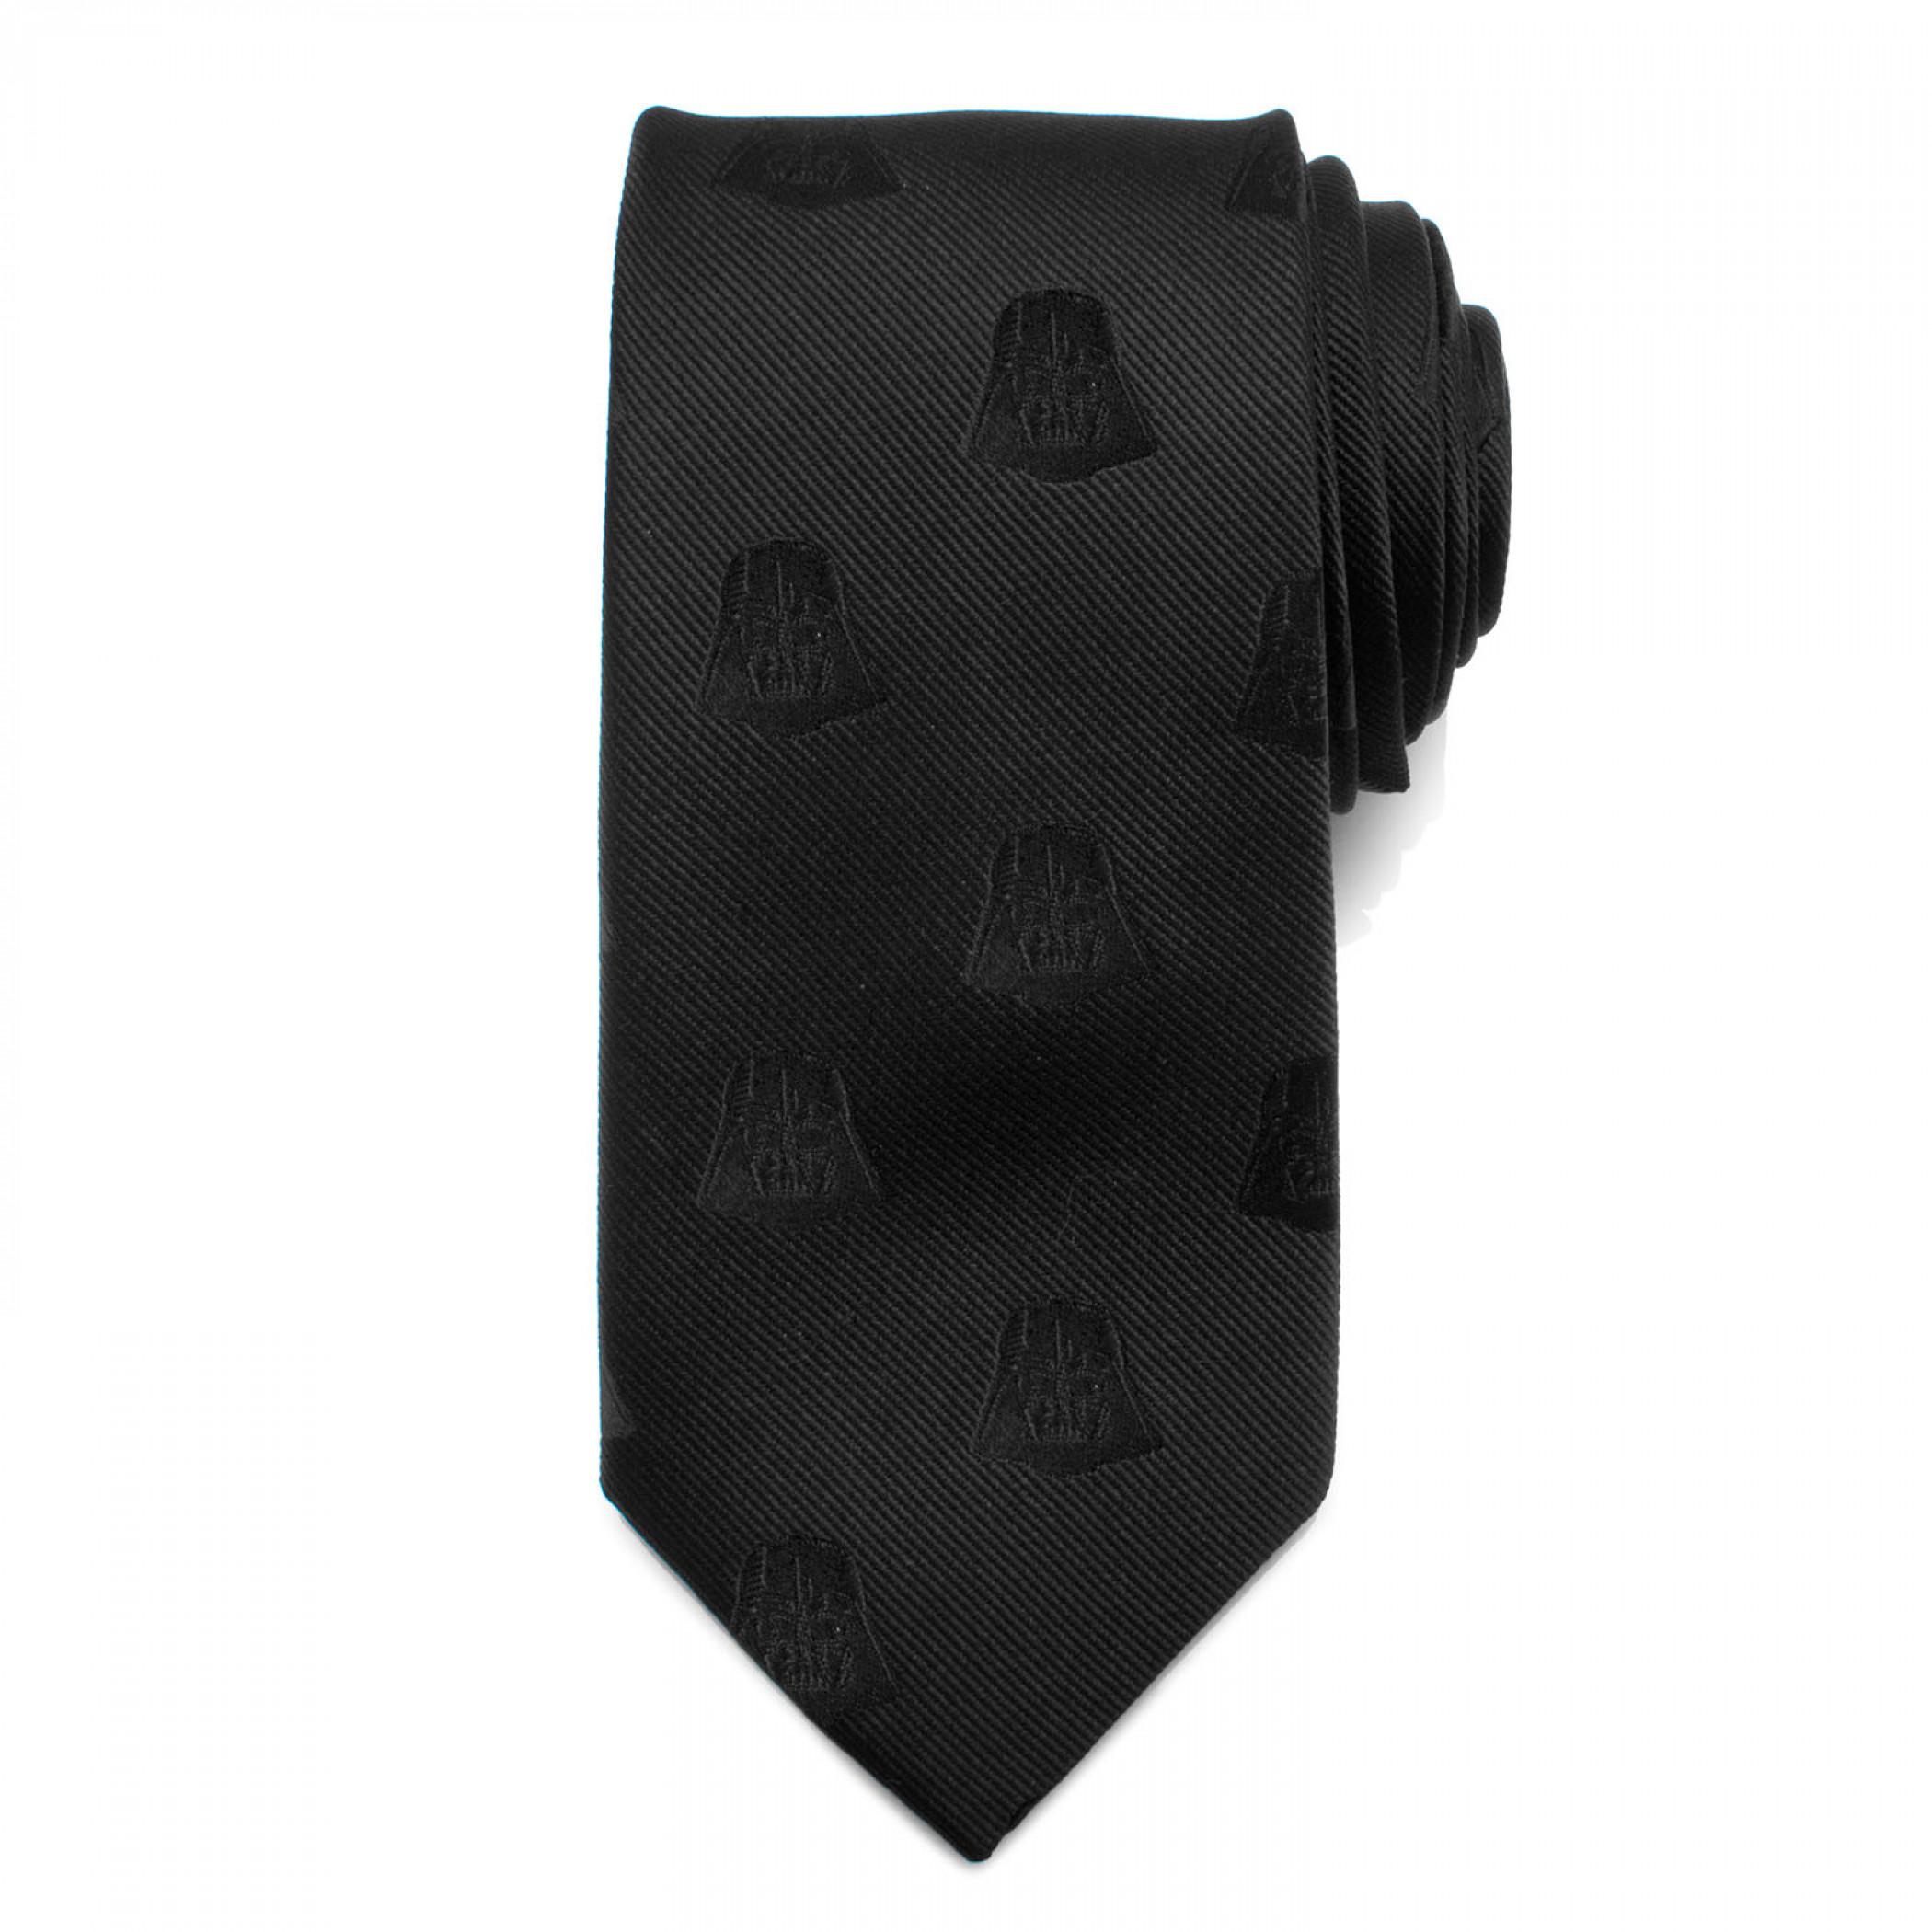 Star Wars Darth Vader Black Silk Tie